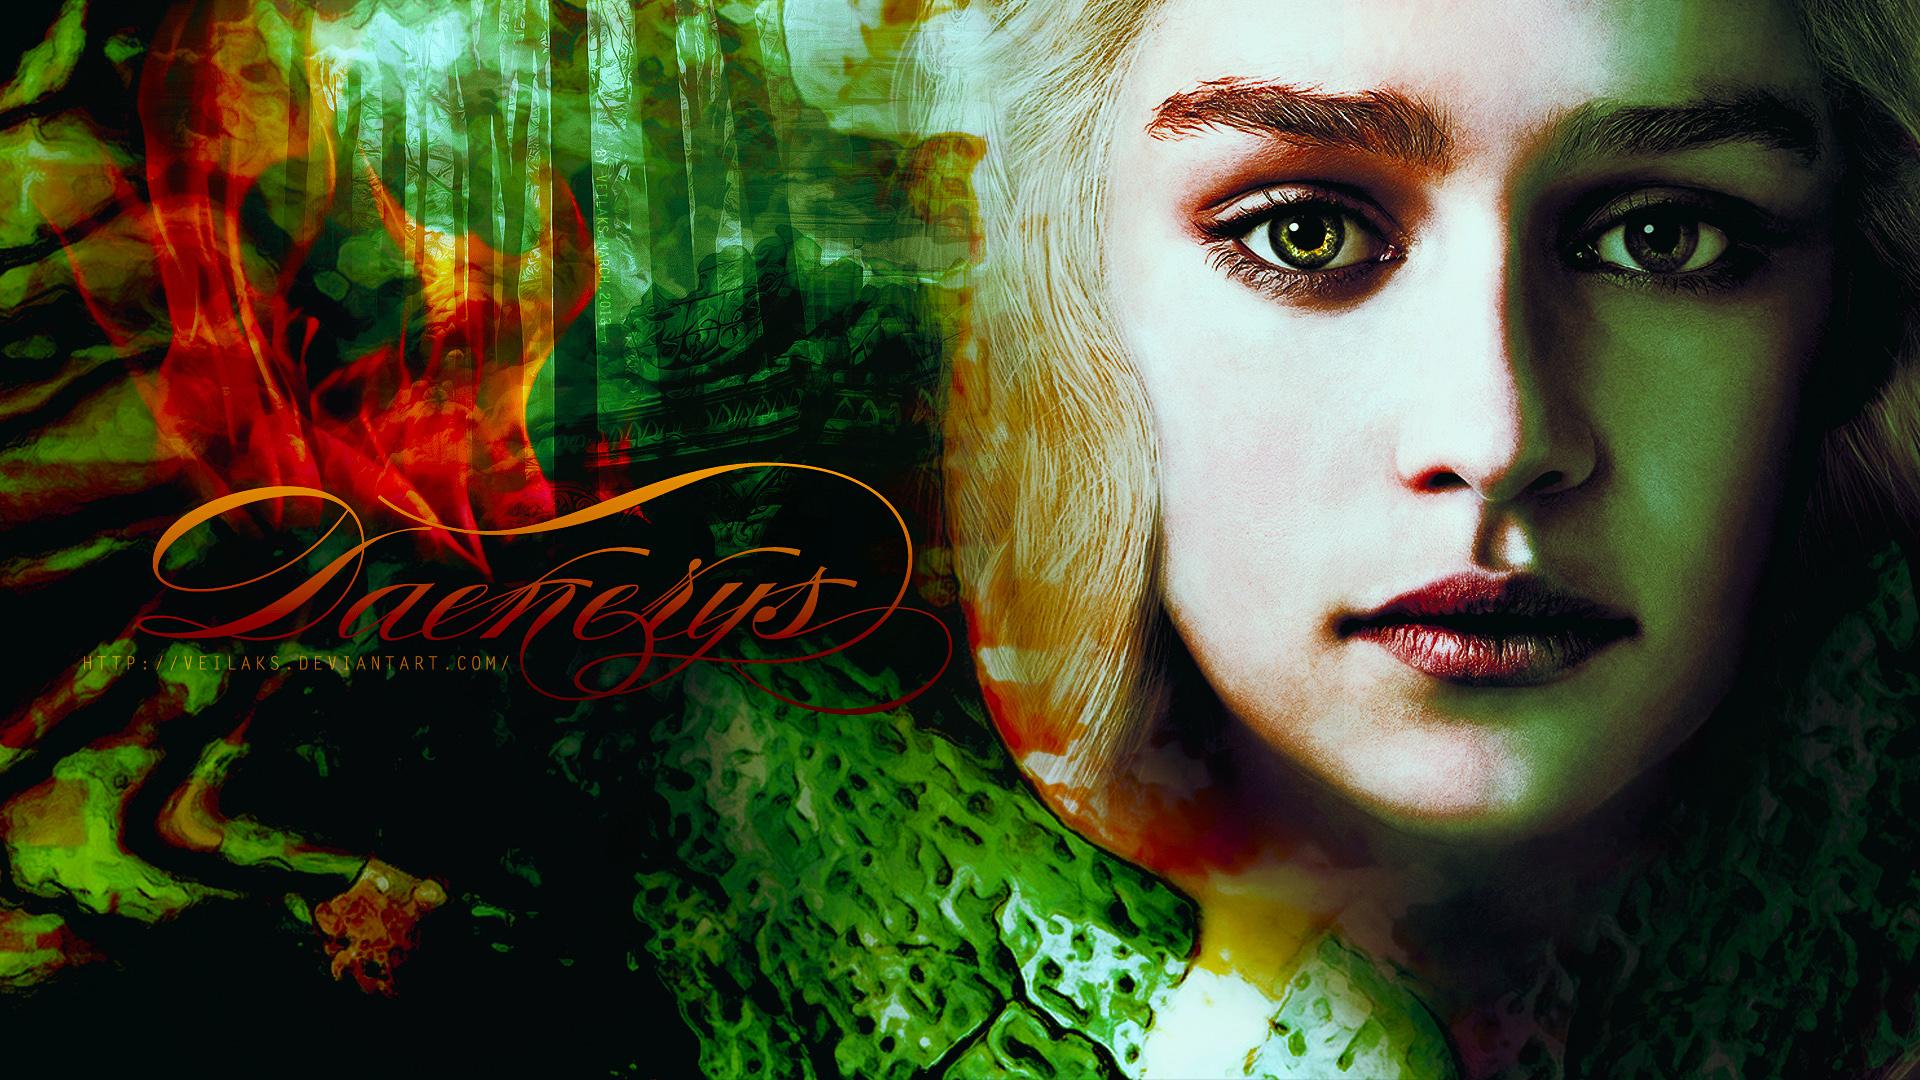 Daenerys-Targaryen-game-of-thrones-wallpaper-wp3404396